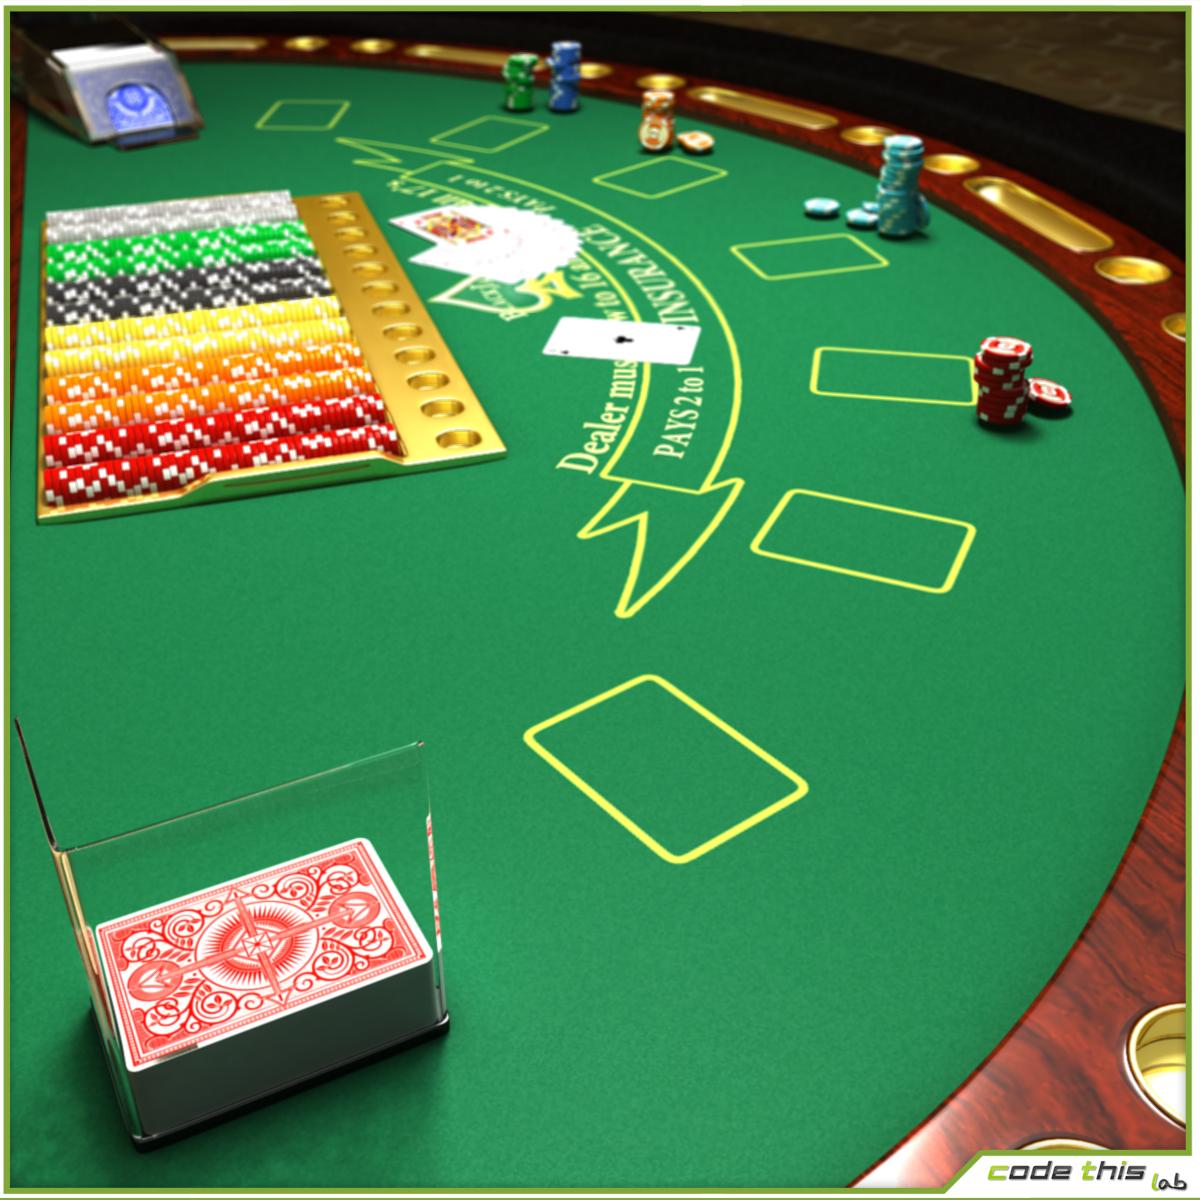 Image of: blackjack table rules